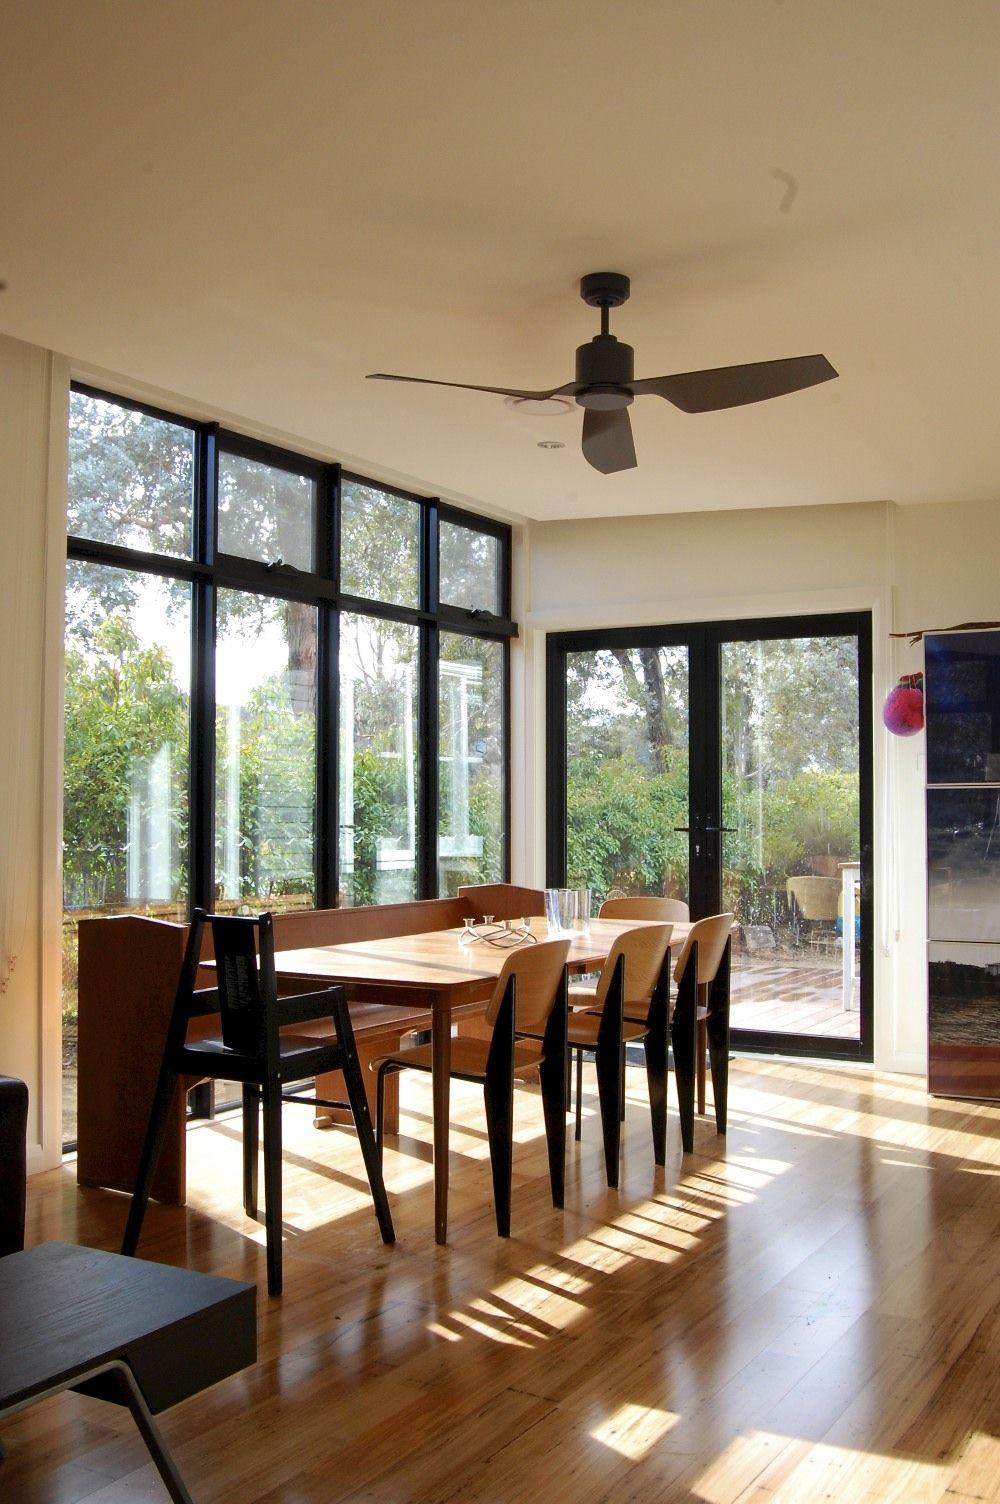 lovely sunny spot for a meal. vintage danish teak table, 60s